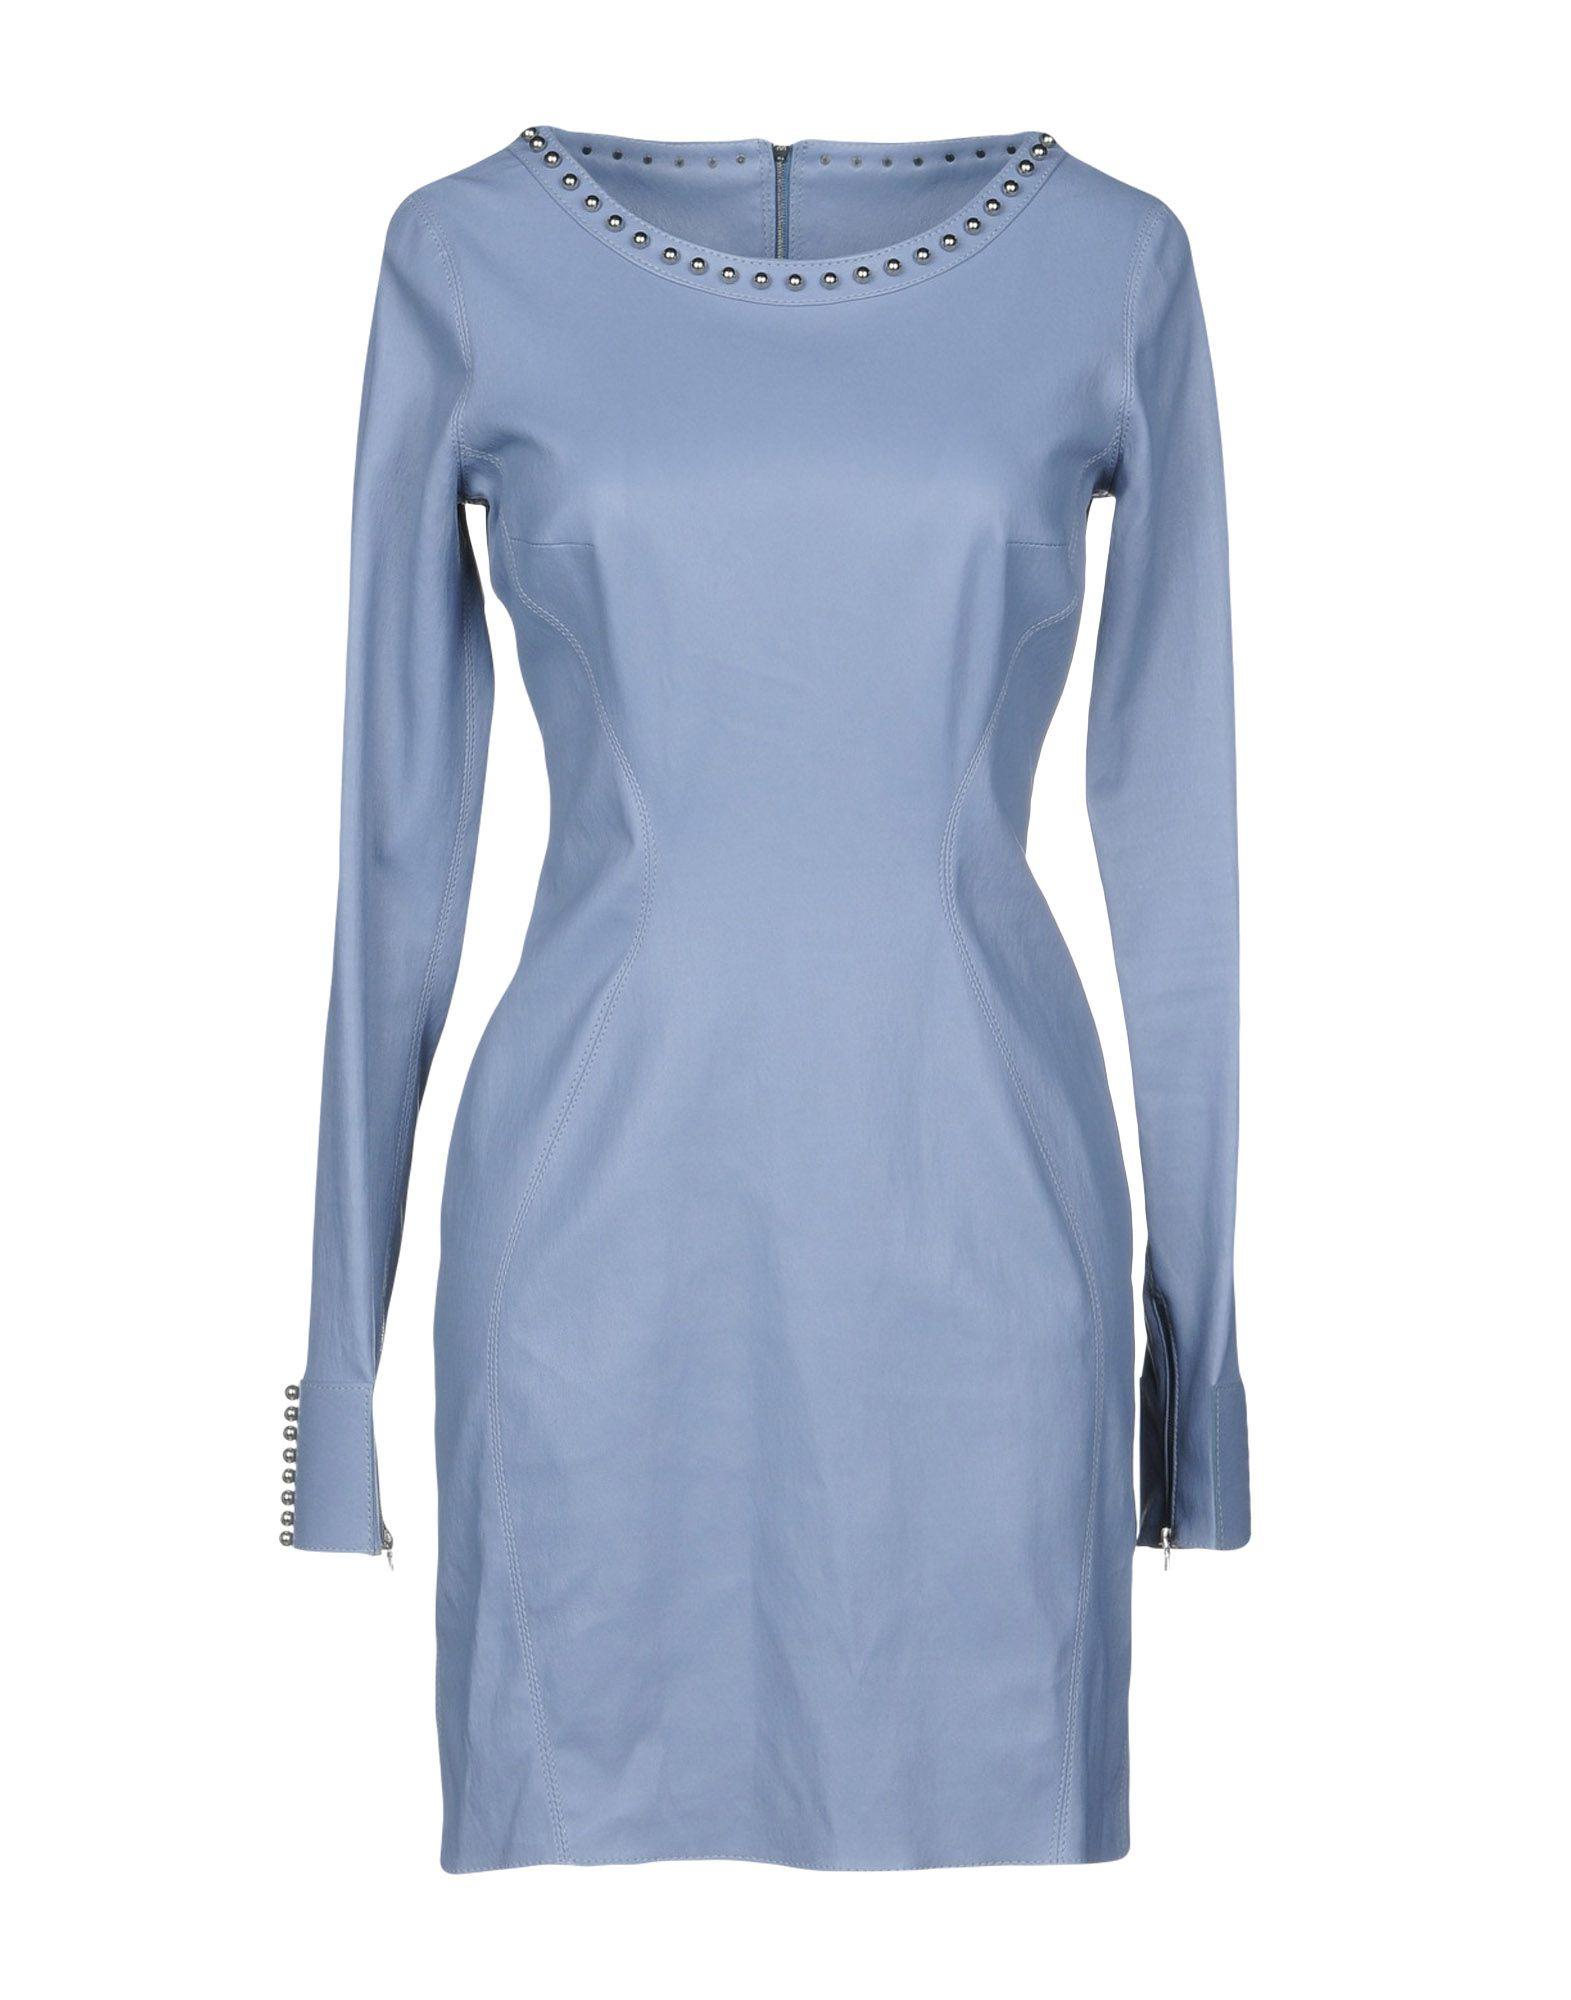 APHERO Short Dress in Sky Blue